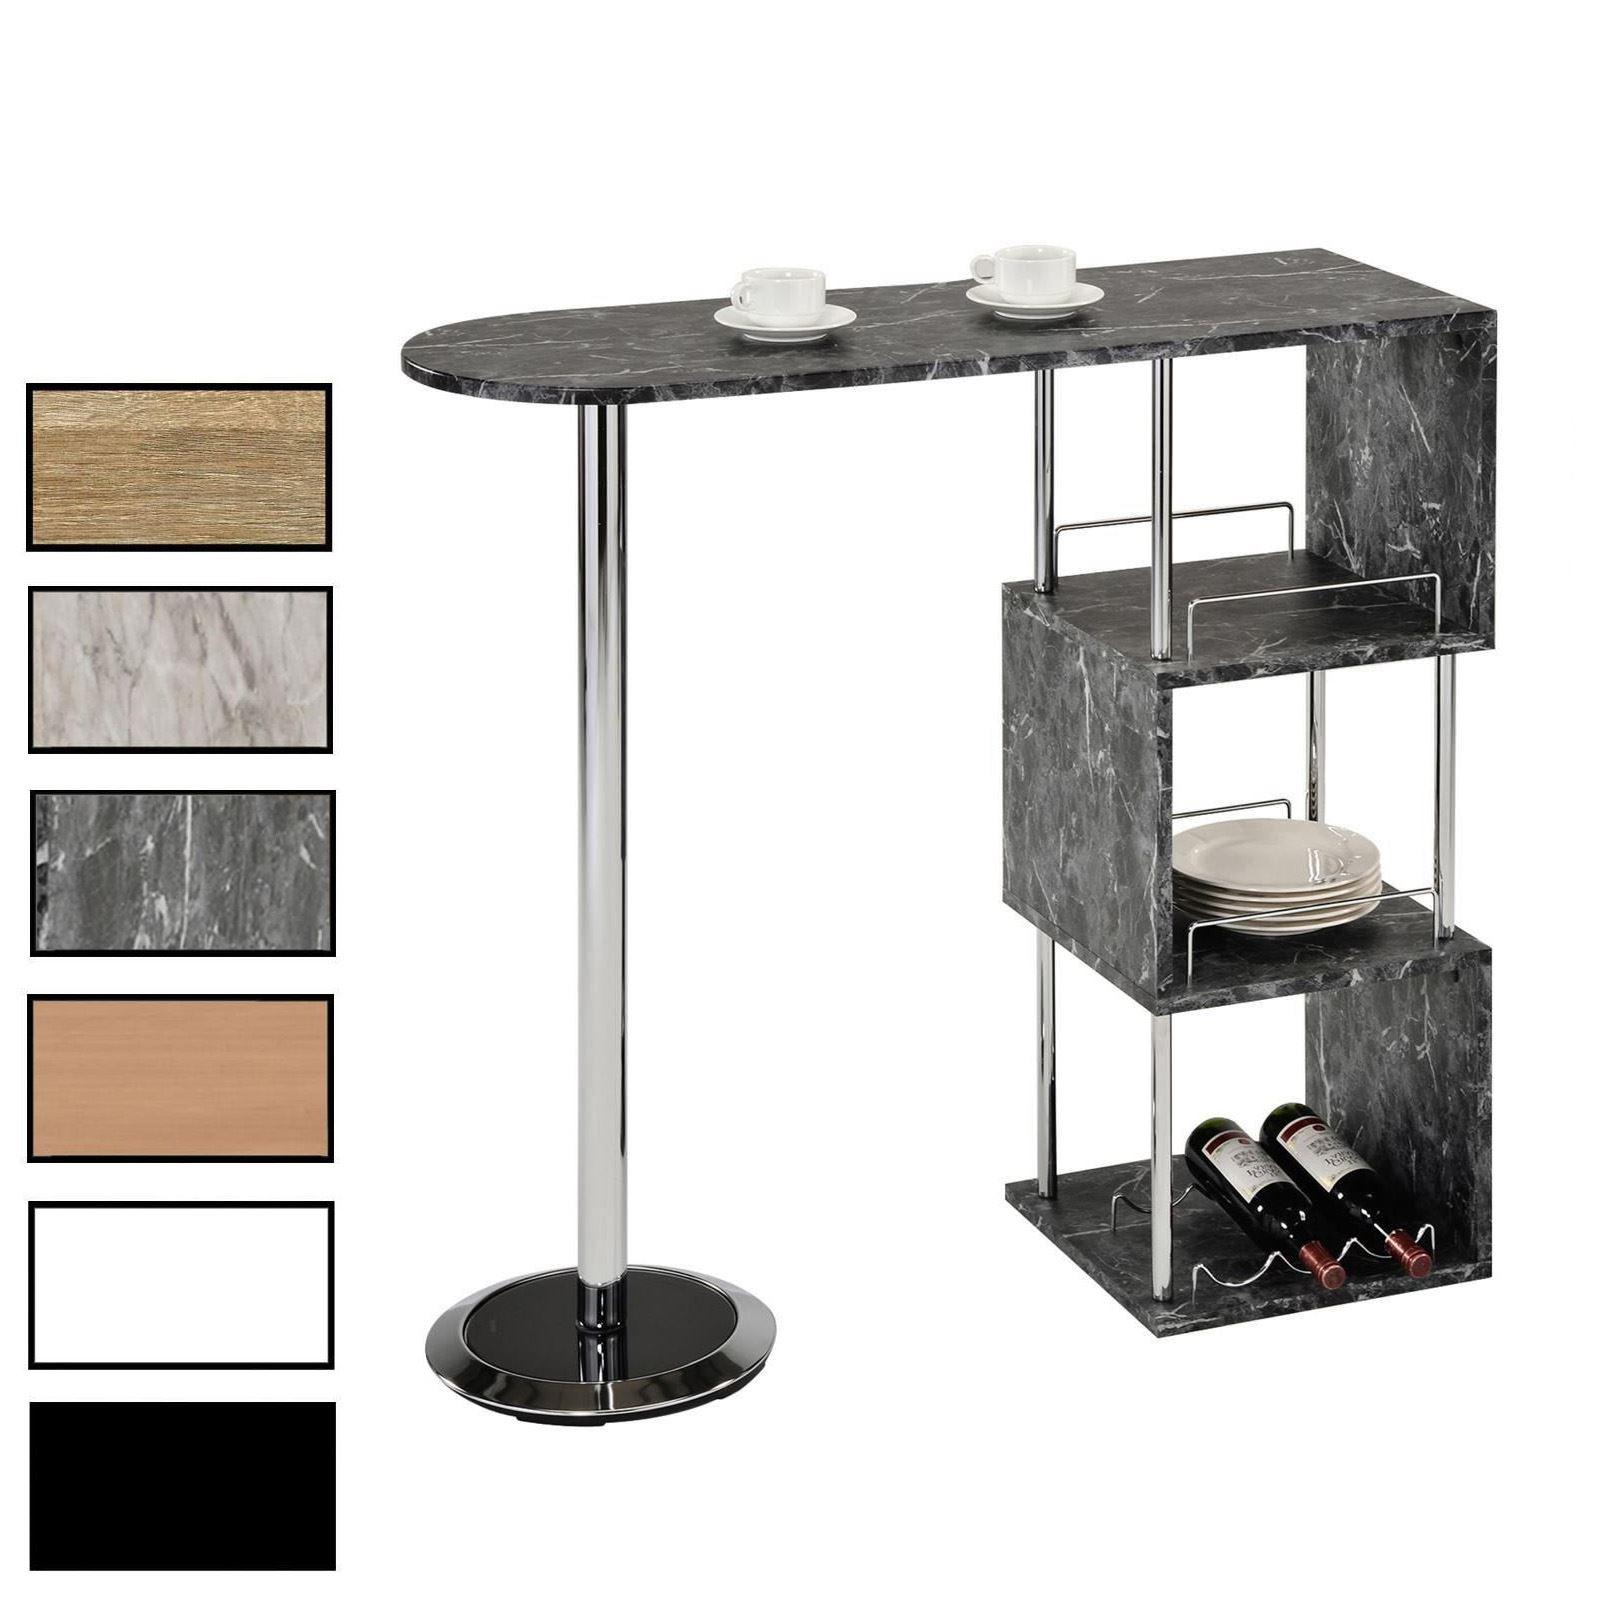 bartisch vigando in versch farben mobilia24. Black Bedroom Furniture Sets. Home Design Ideas